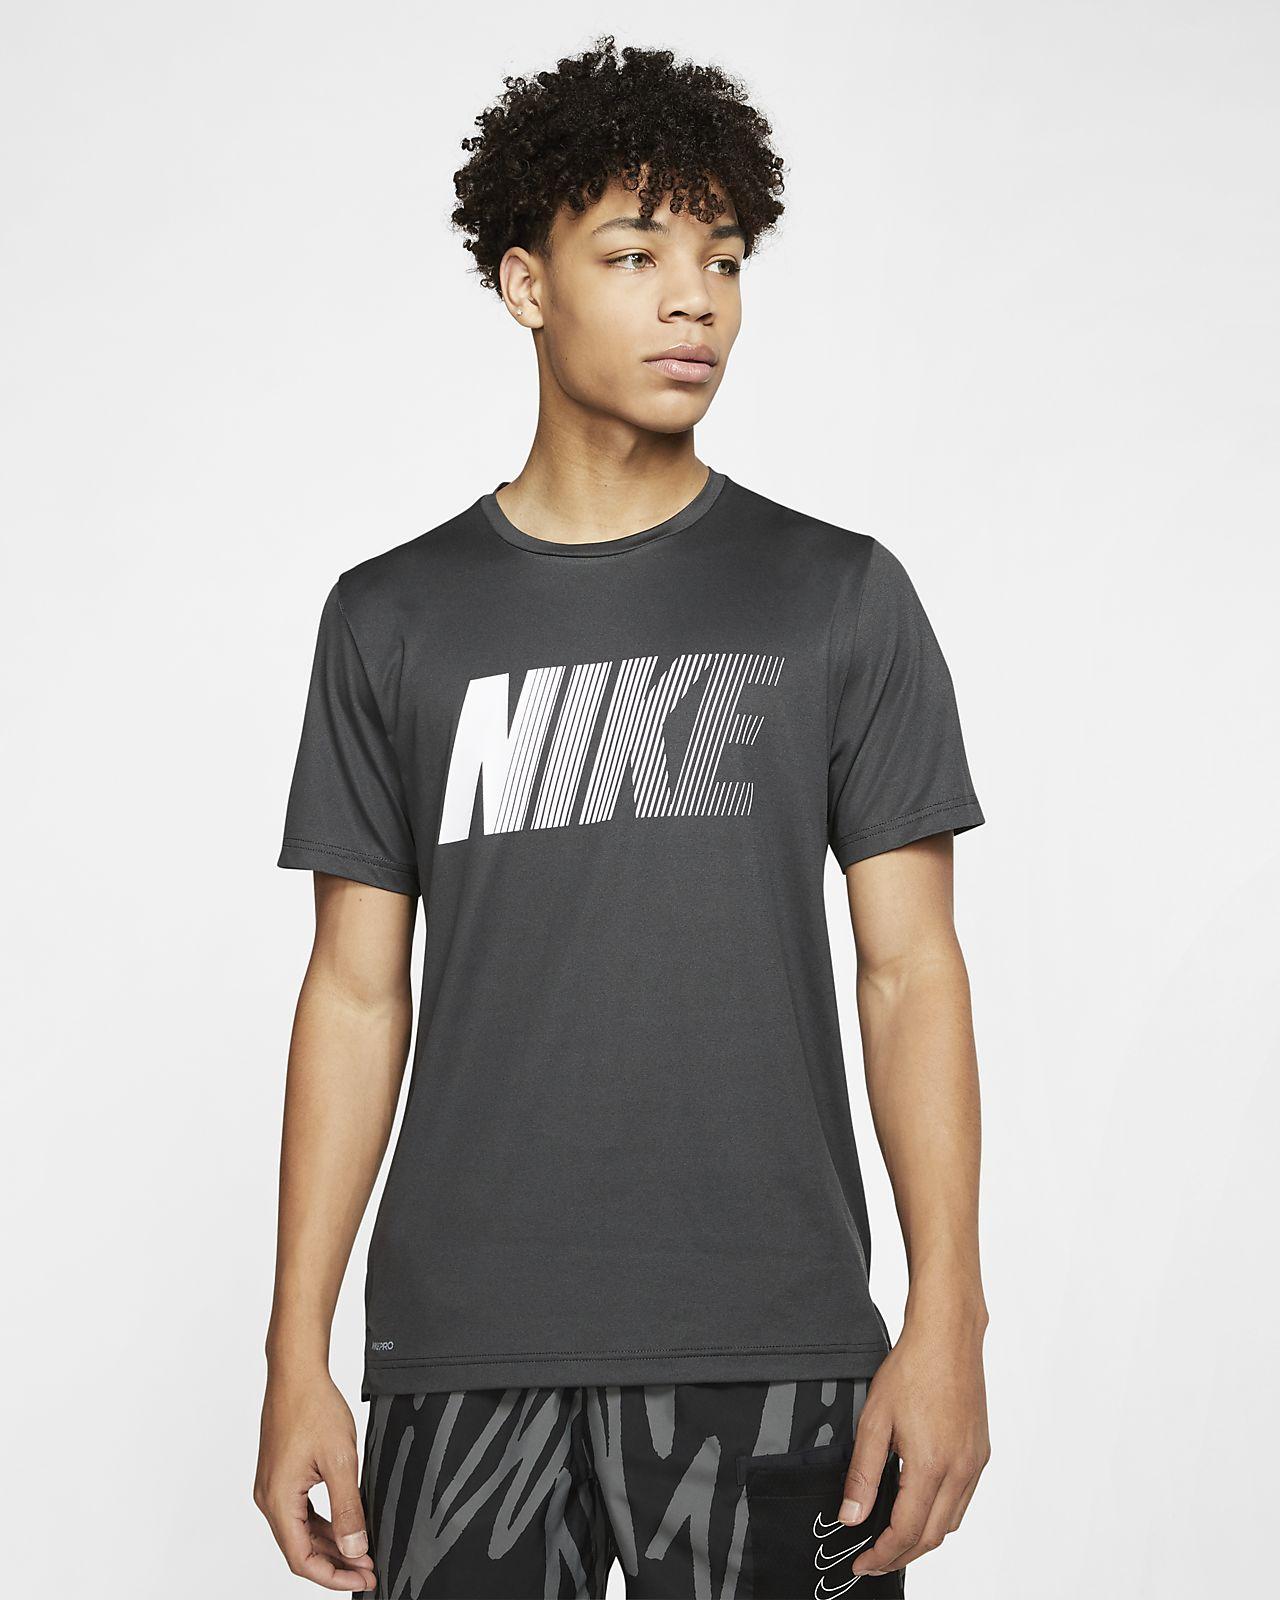 Nike Dri-FIT 男子印花短袖训练上衣